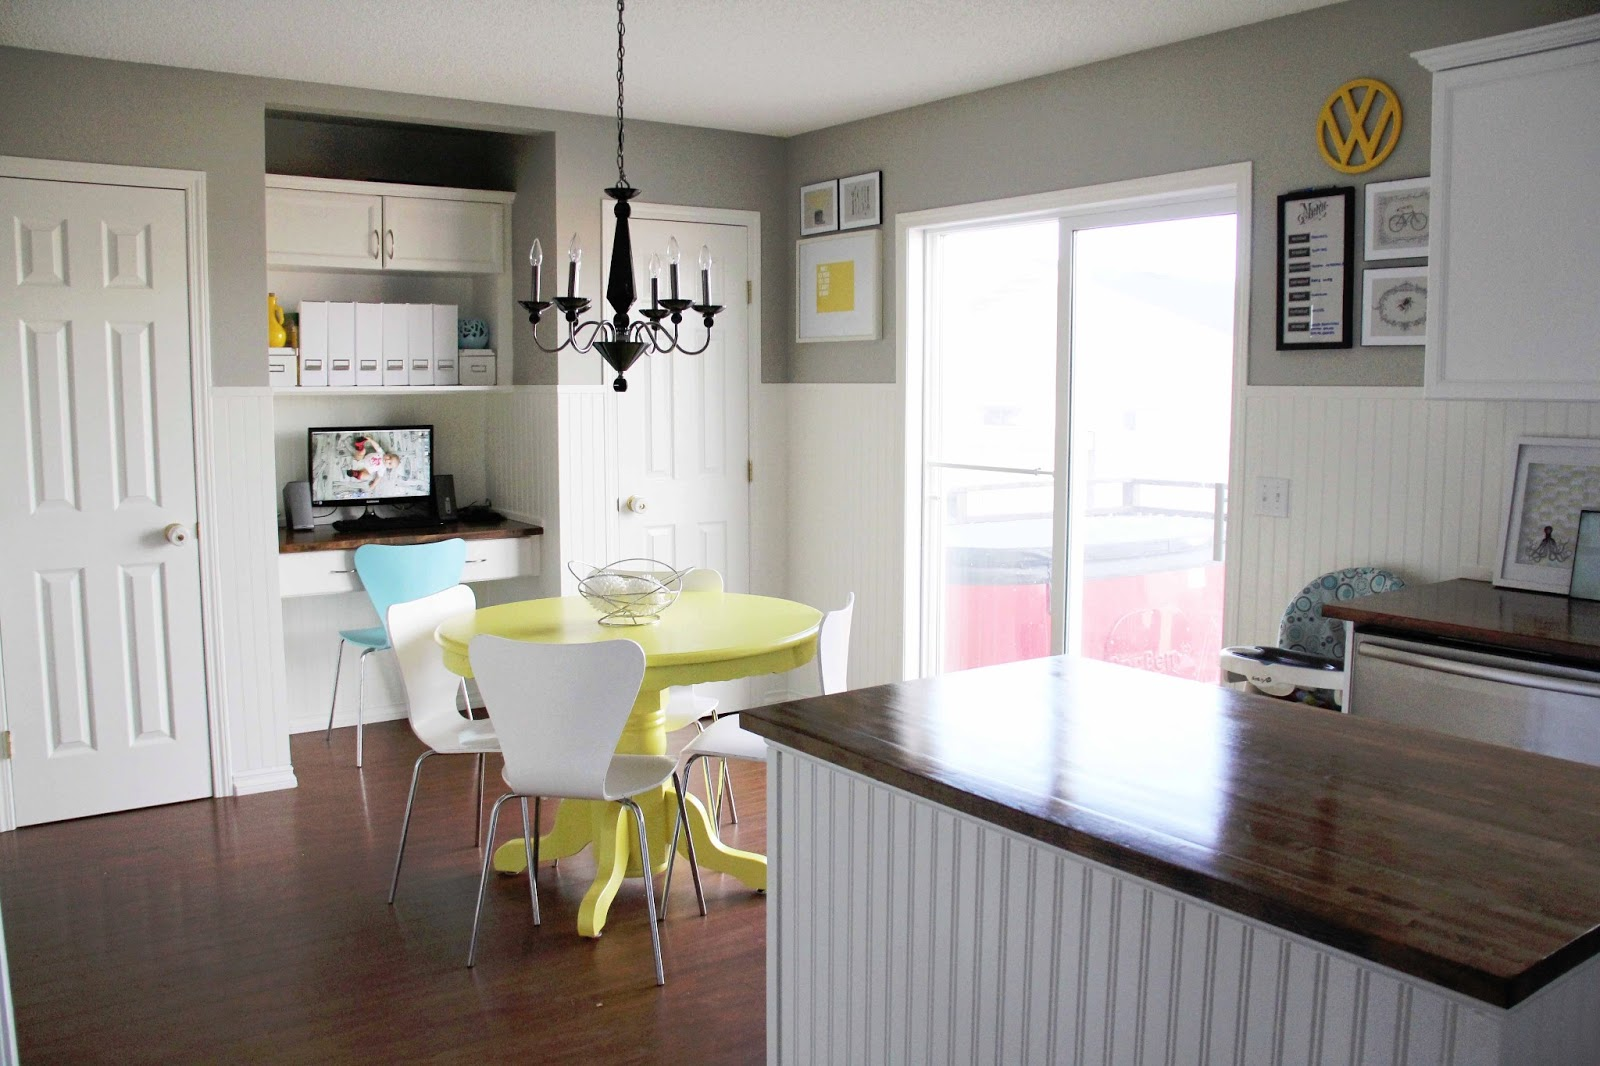 Bright Family Kitchen DIY Under $500 - Brooklyn Berry Designs